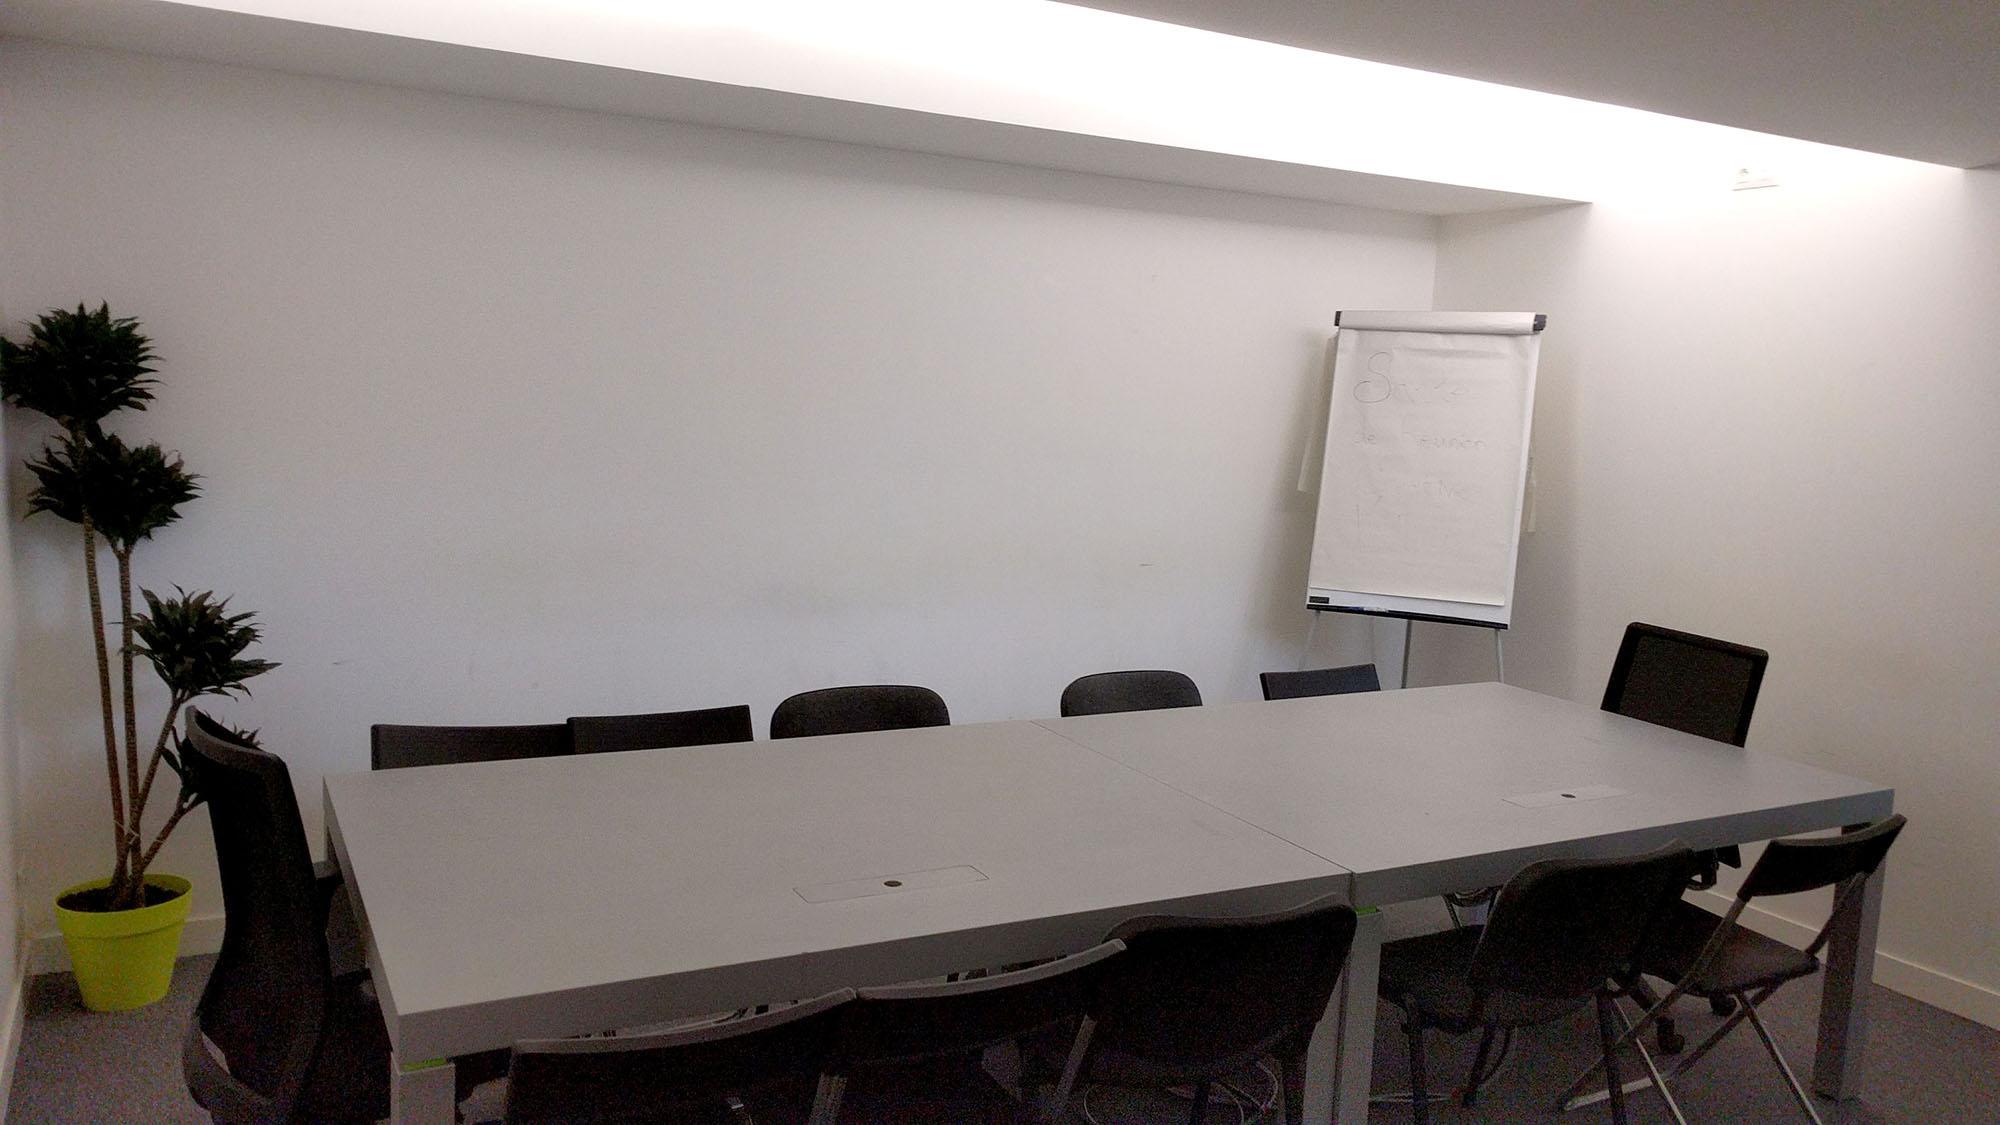 hire meeting room in the kremlin bicetre near paris for 15 people. Black Bedroom Furniture Sets. Home Design Ideas